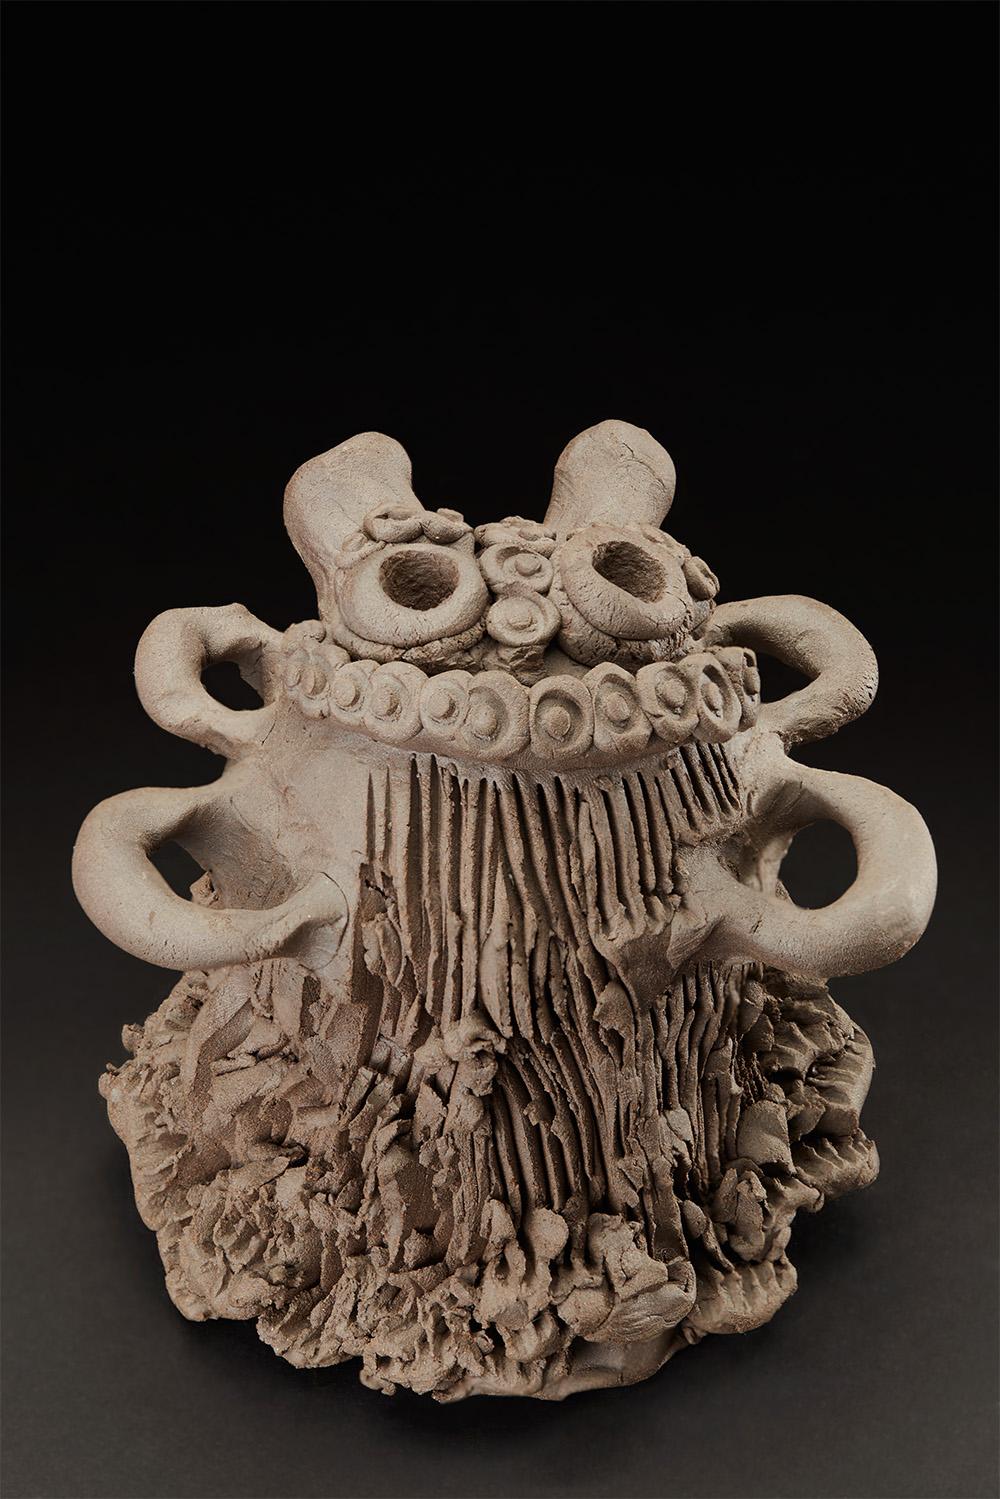 Masami Yamagiwa    Untitled  , 2007 Fired Ceramic 6 x 5.5 x 5 inches 15.2 x 14 x 12.7 cm MYa 5